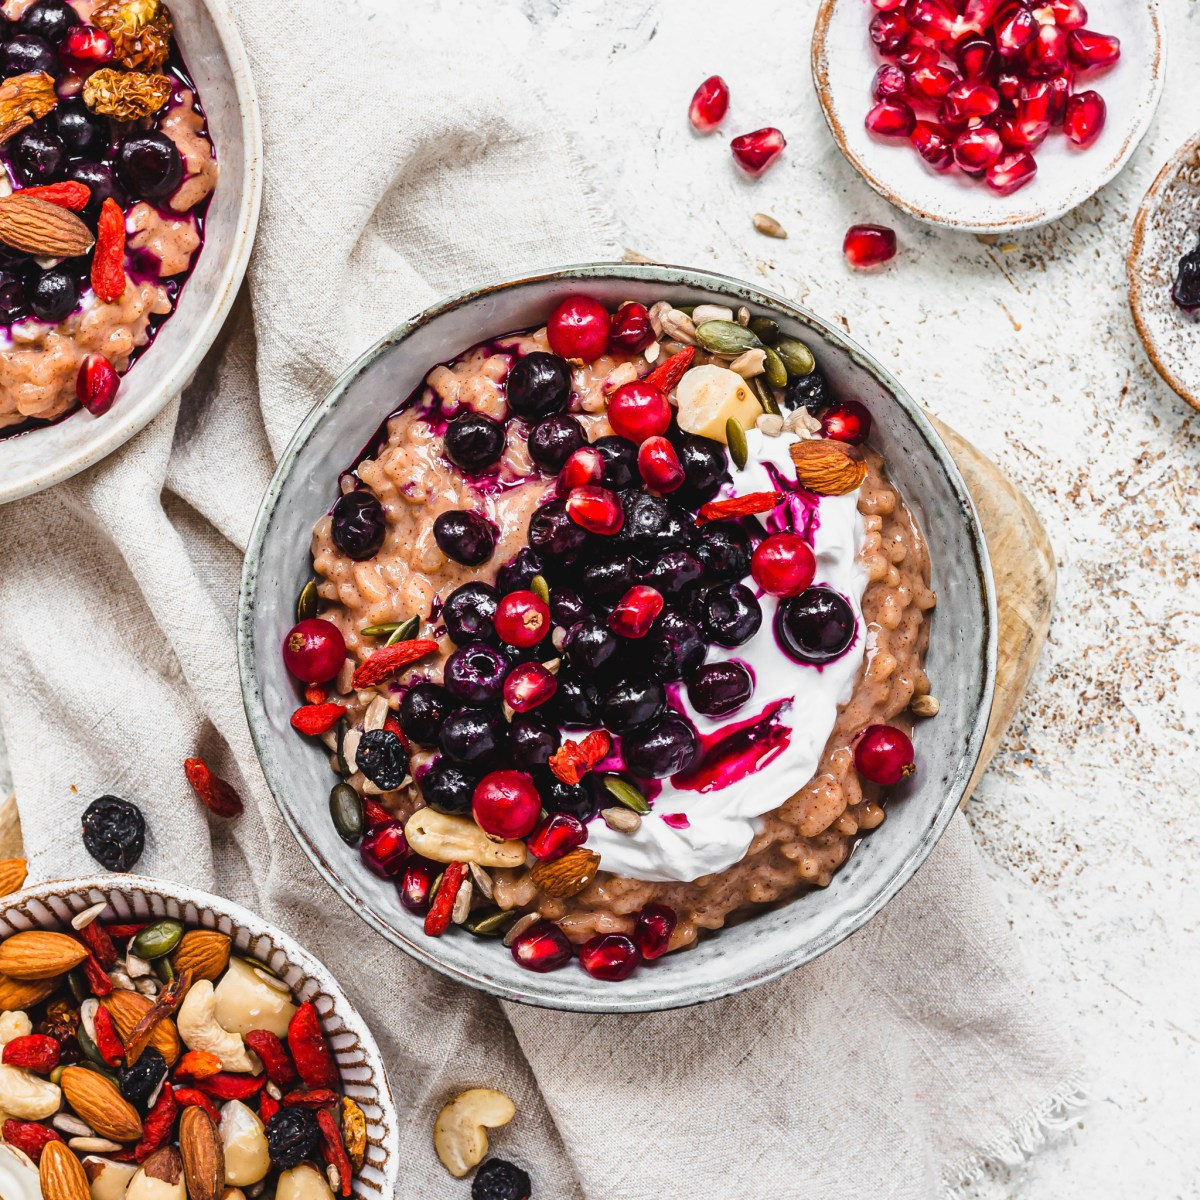 Blueberry Goji and Almond Rice Pudding